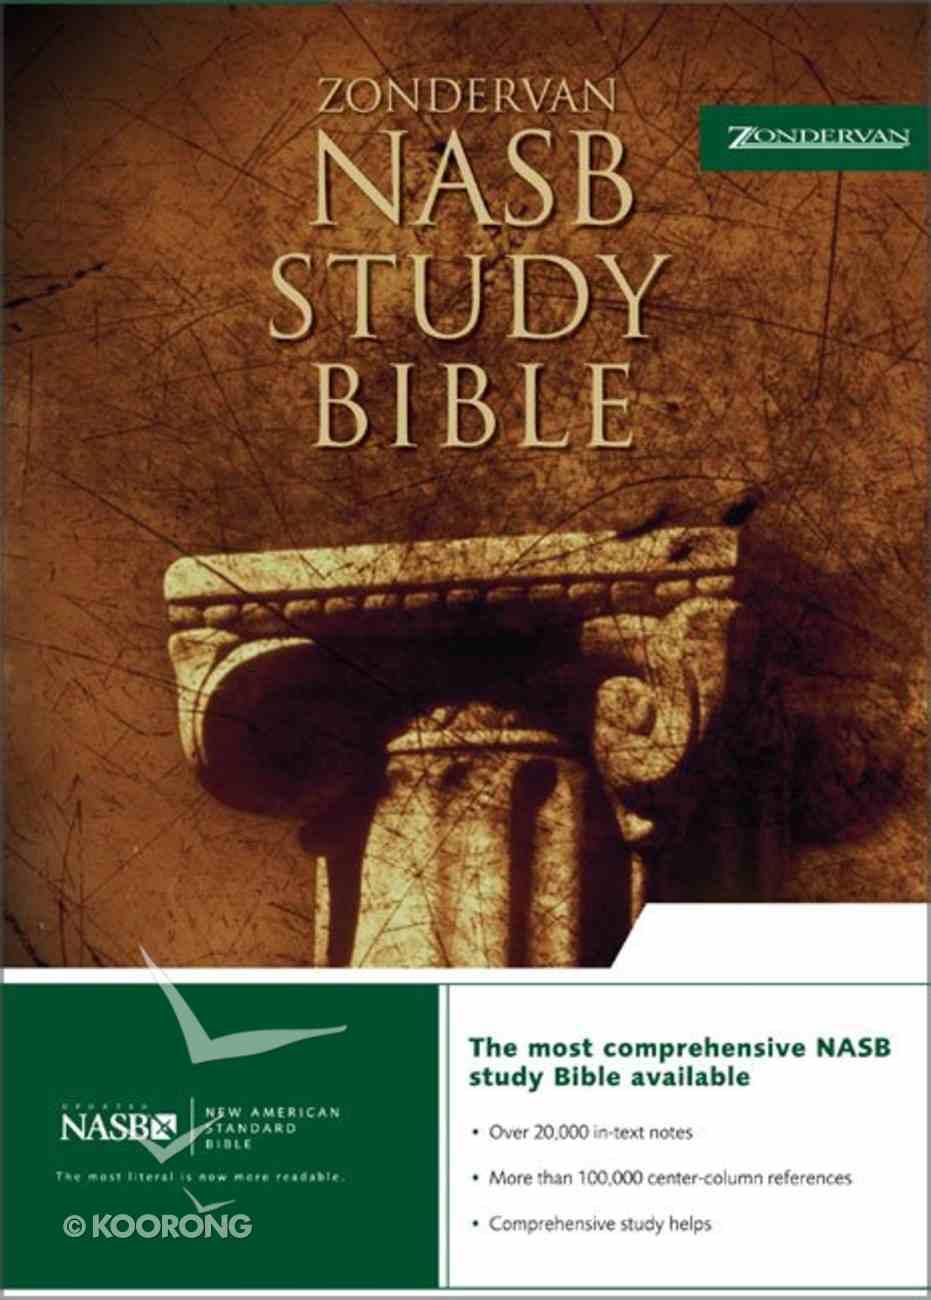 Zondervan NASB Updated Study Bible Burgundy Genuine Leather